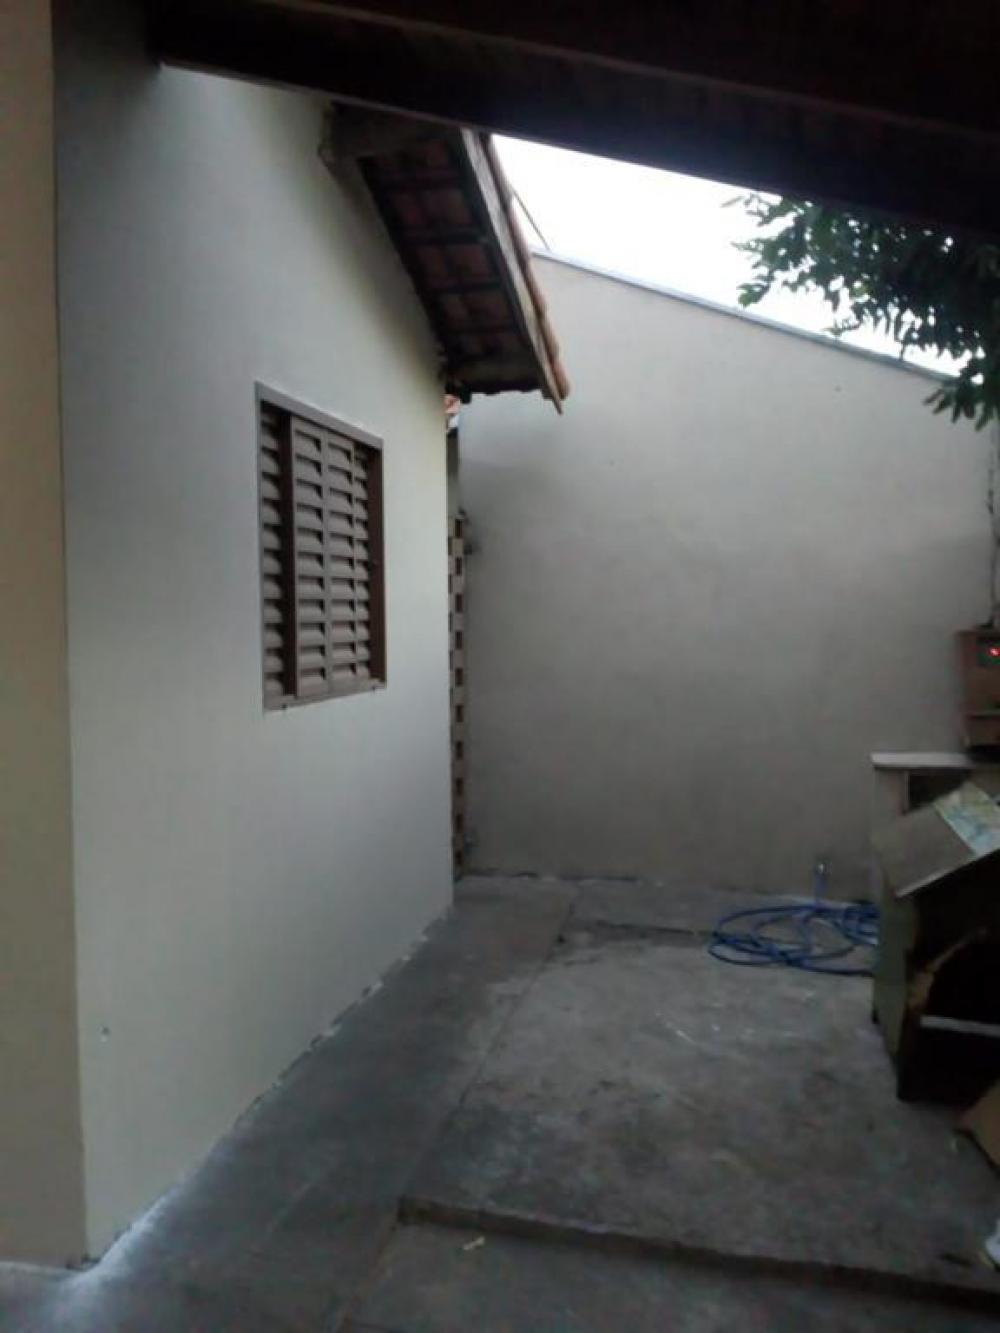 Comprar Casa / Condomínio em Mirassol R$ 168.000,00 - Foto 5